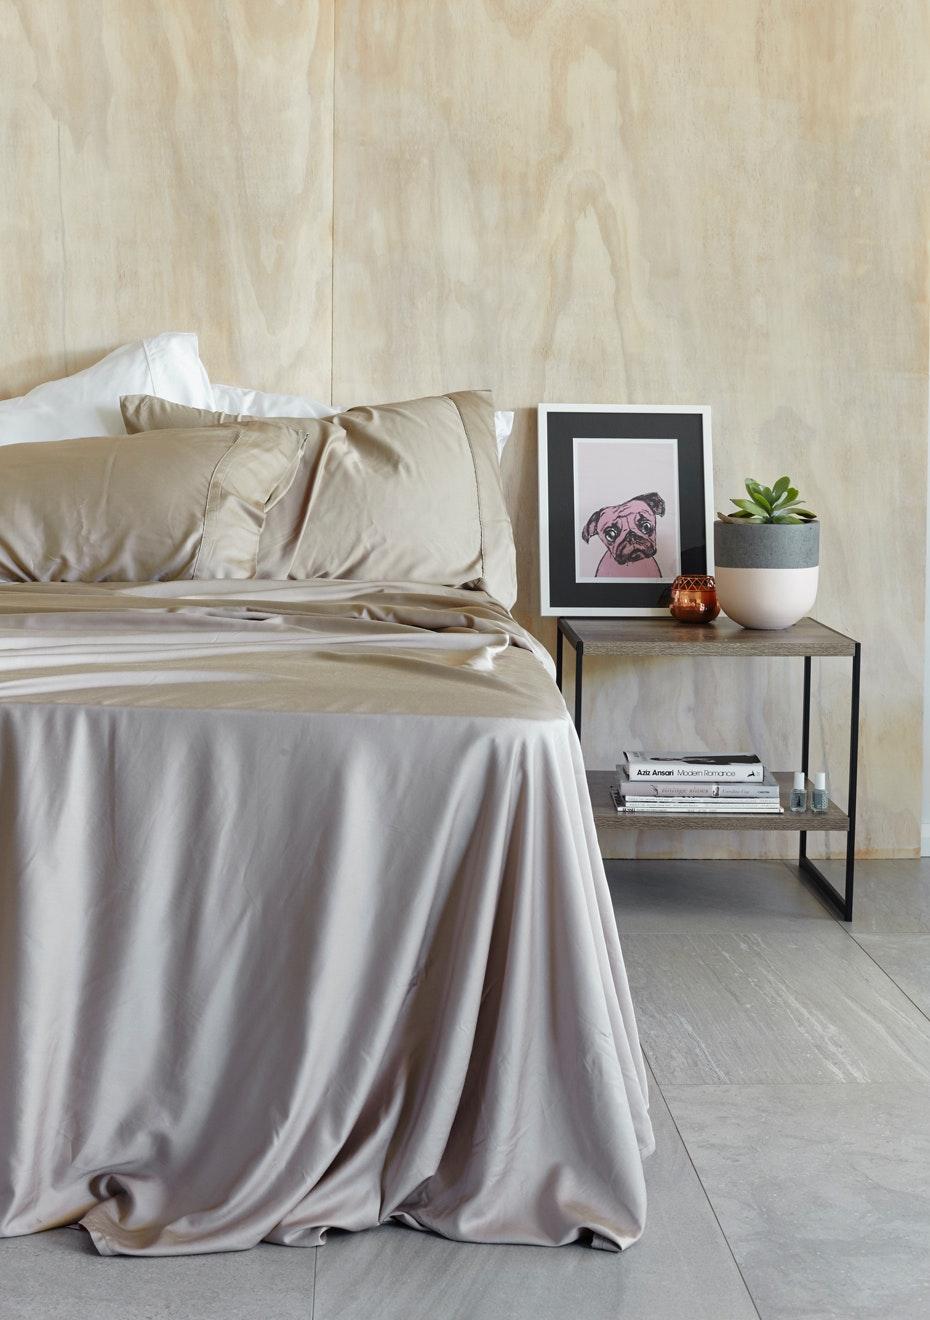 100% Organic Bamboo Sheet Set Queen  Taupe   100% BAMBOO Bed U0026 Bath   Onceit